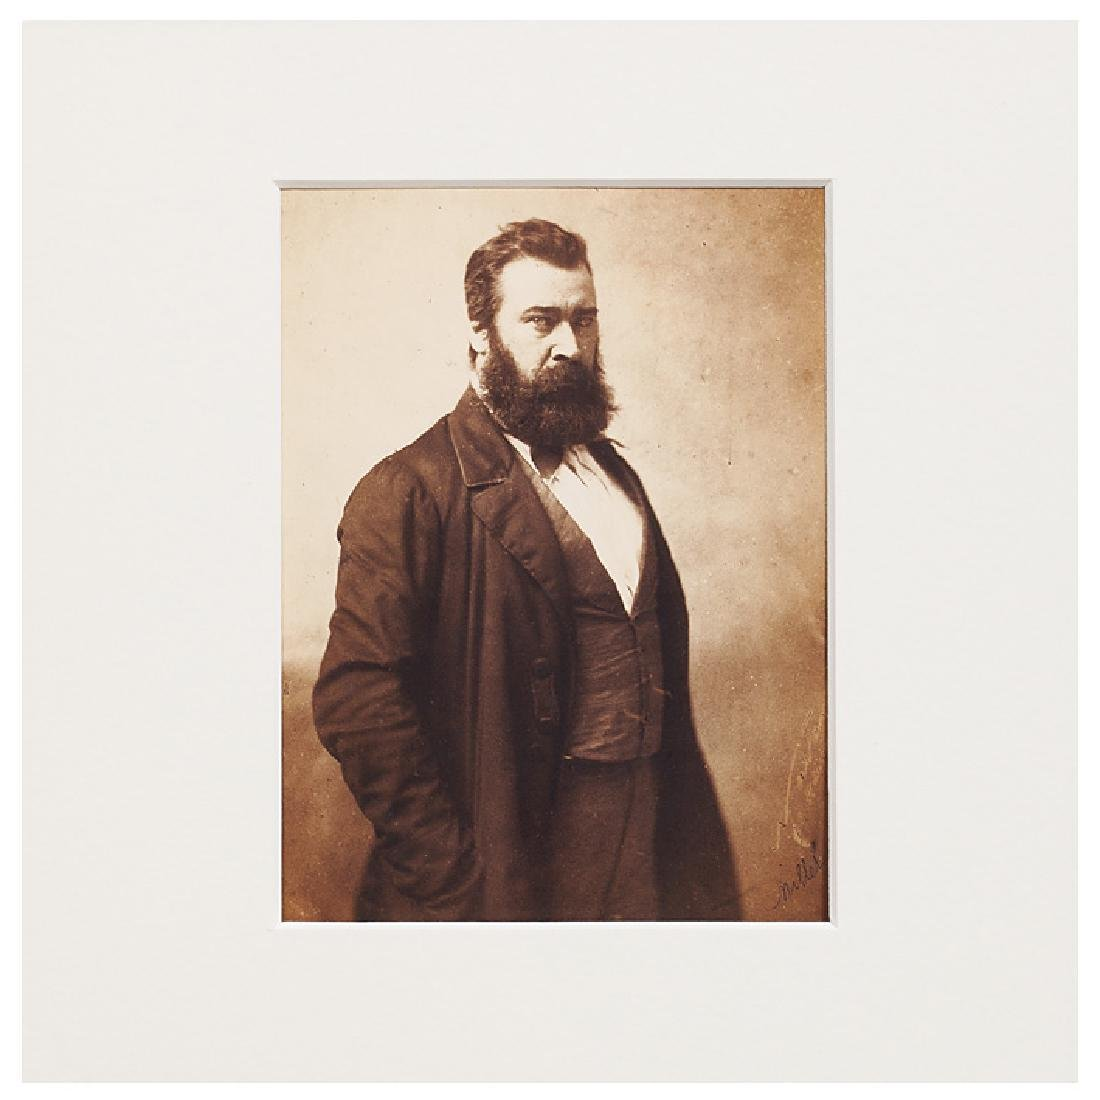 Nadar (French, 1820 - 1910) [Gaspard Félix Tournachon] - 4